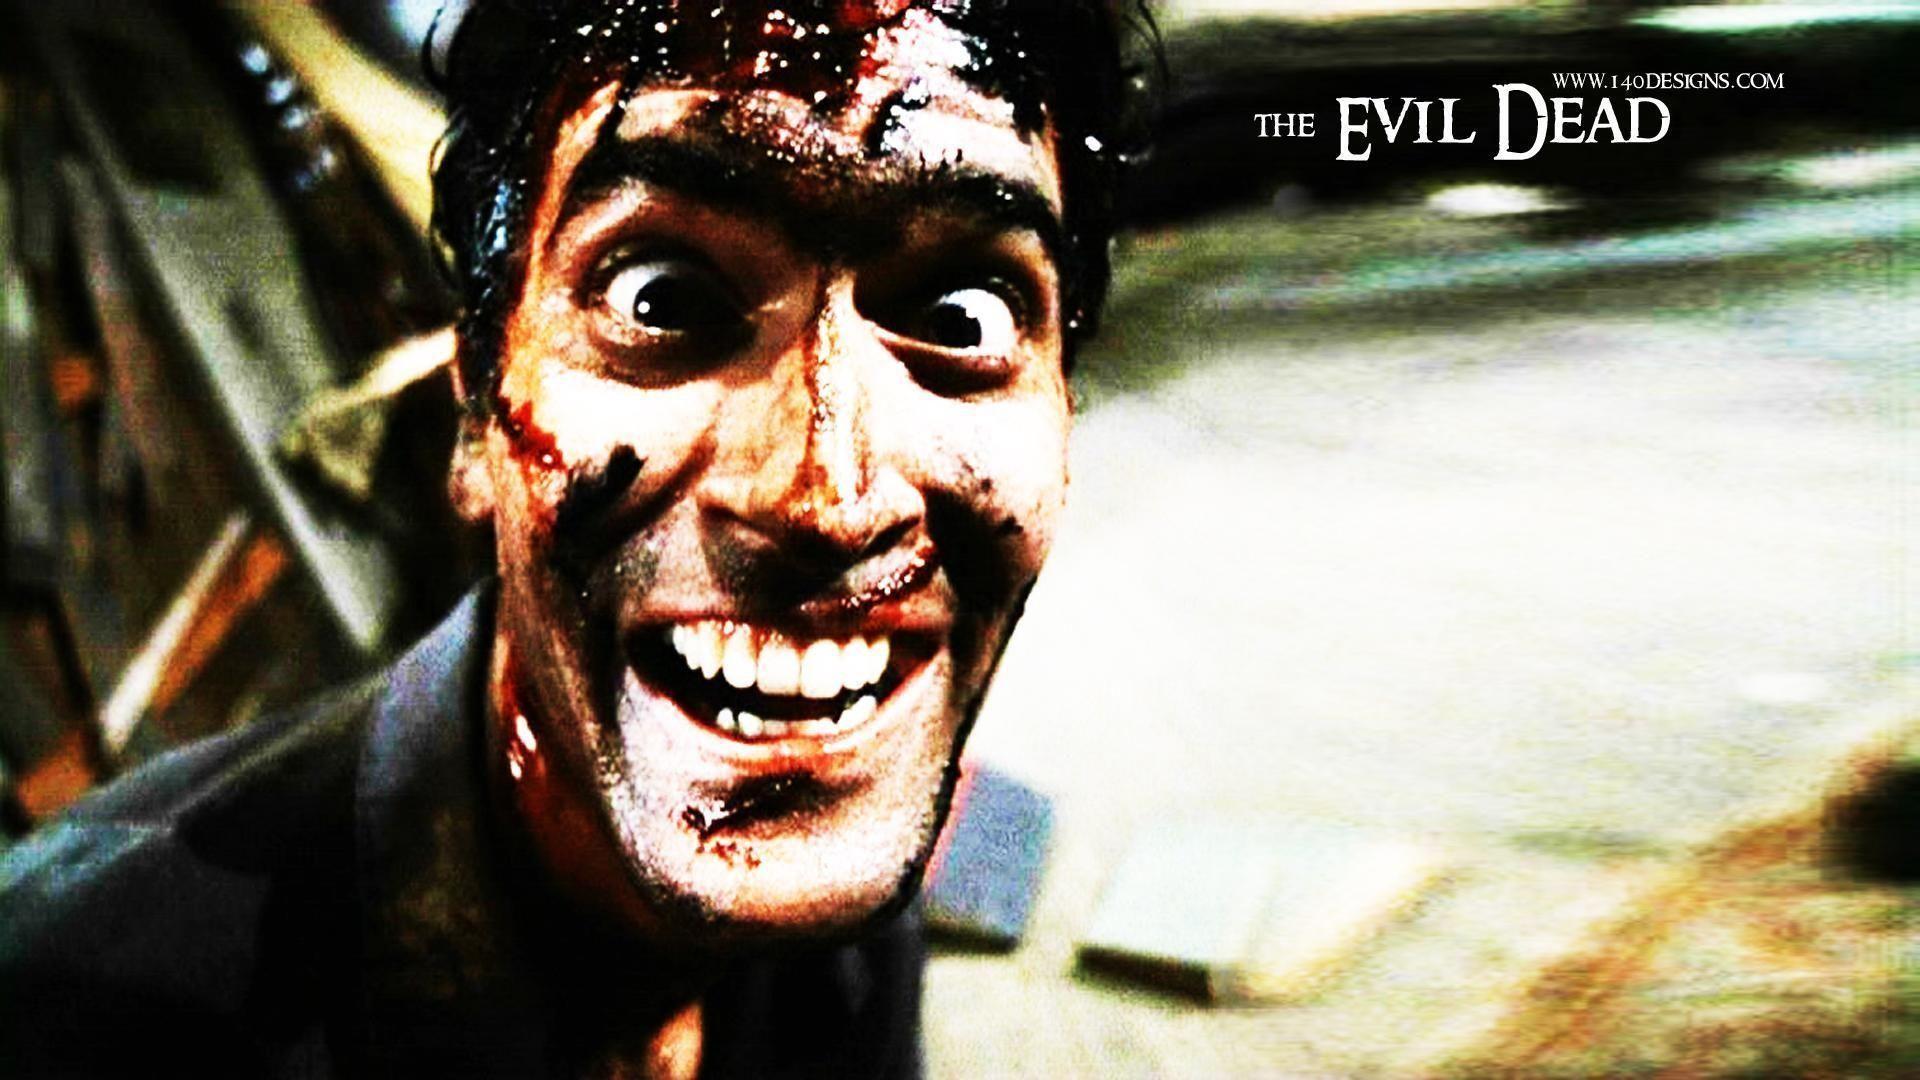 Evil Dead (1981) Wallpapers HD Download